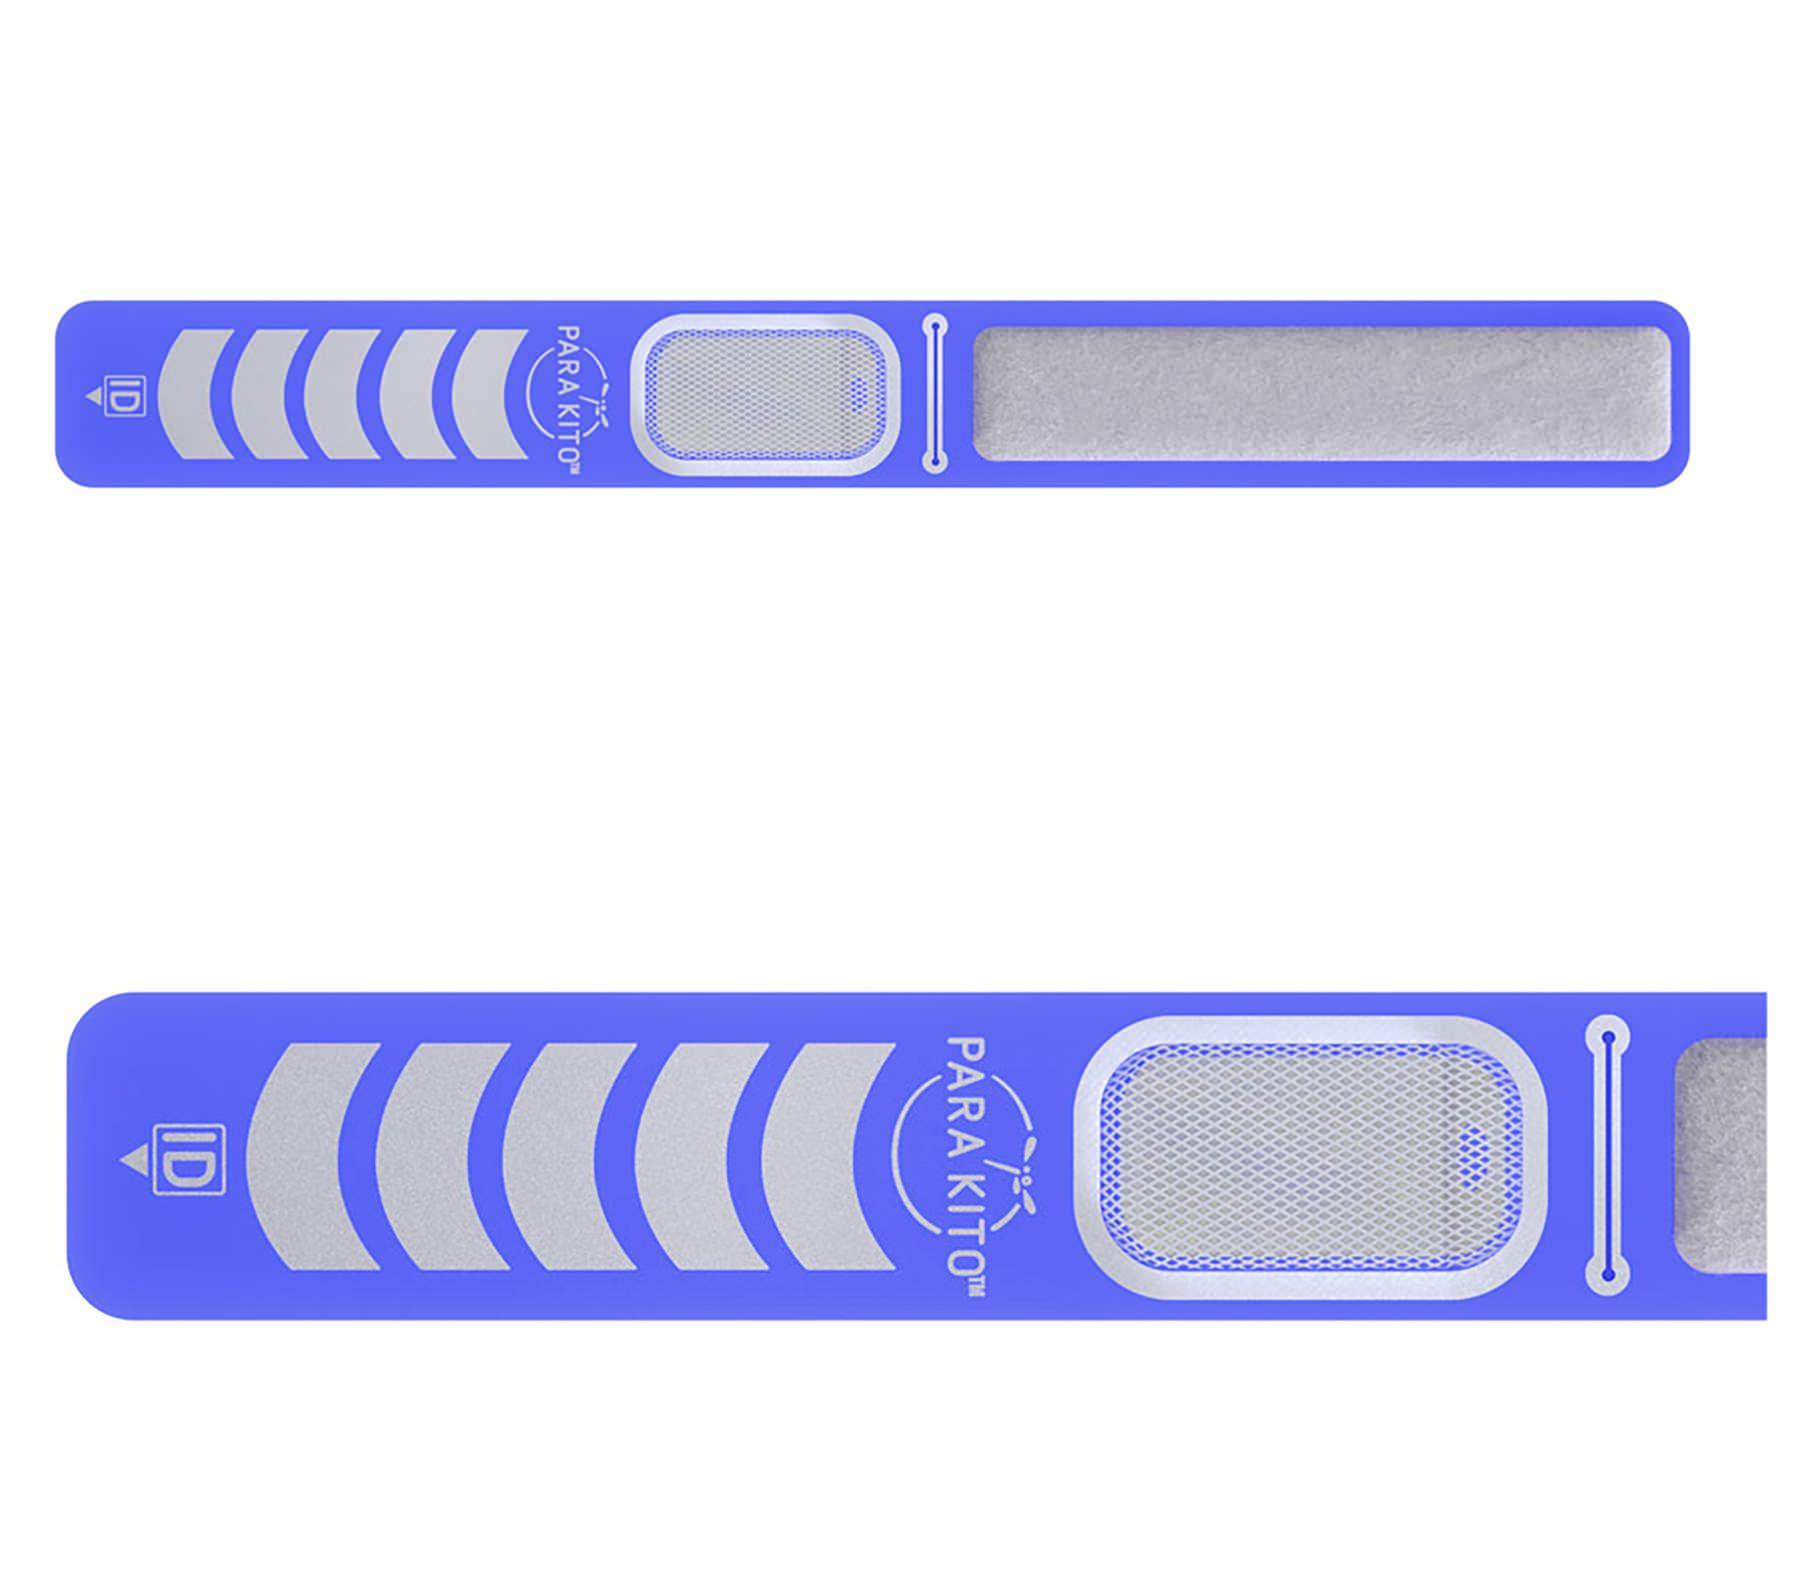 vong-deo-tay-chong-muoi-the-thao-Parakito-Blue-Sport-Band-8025-xanh-duong-2.jpg